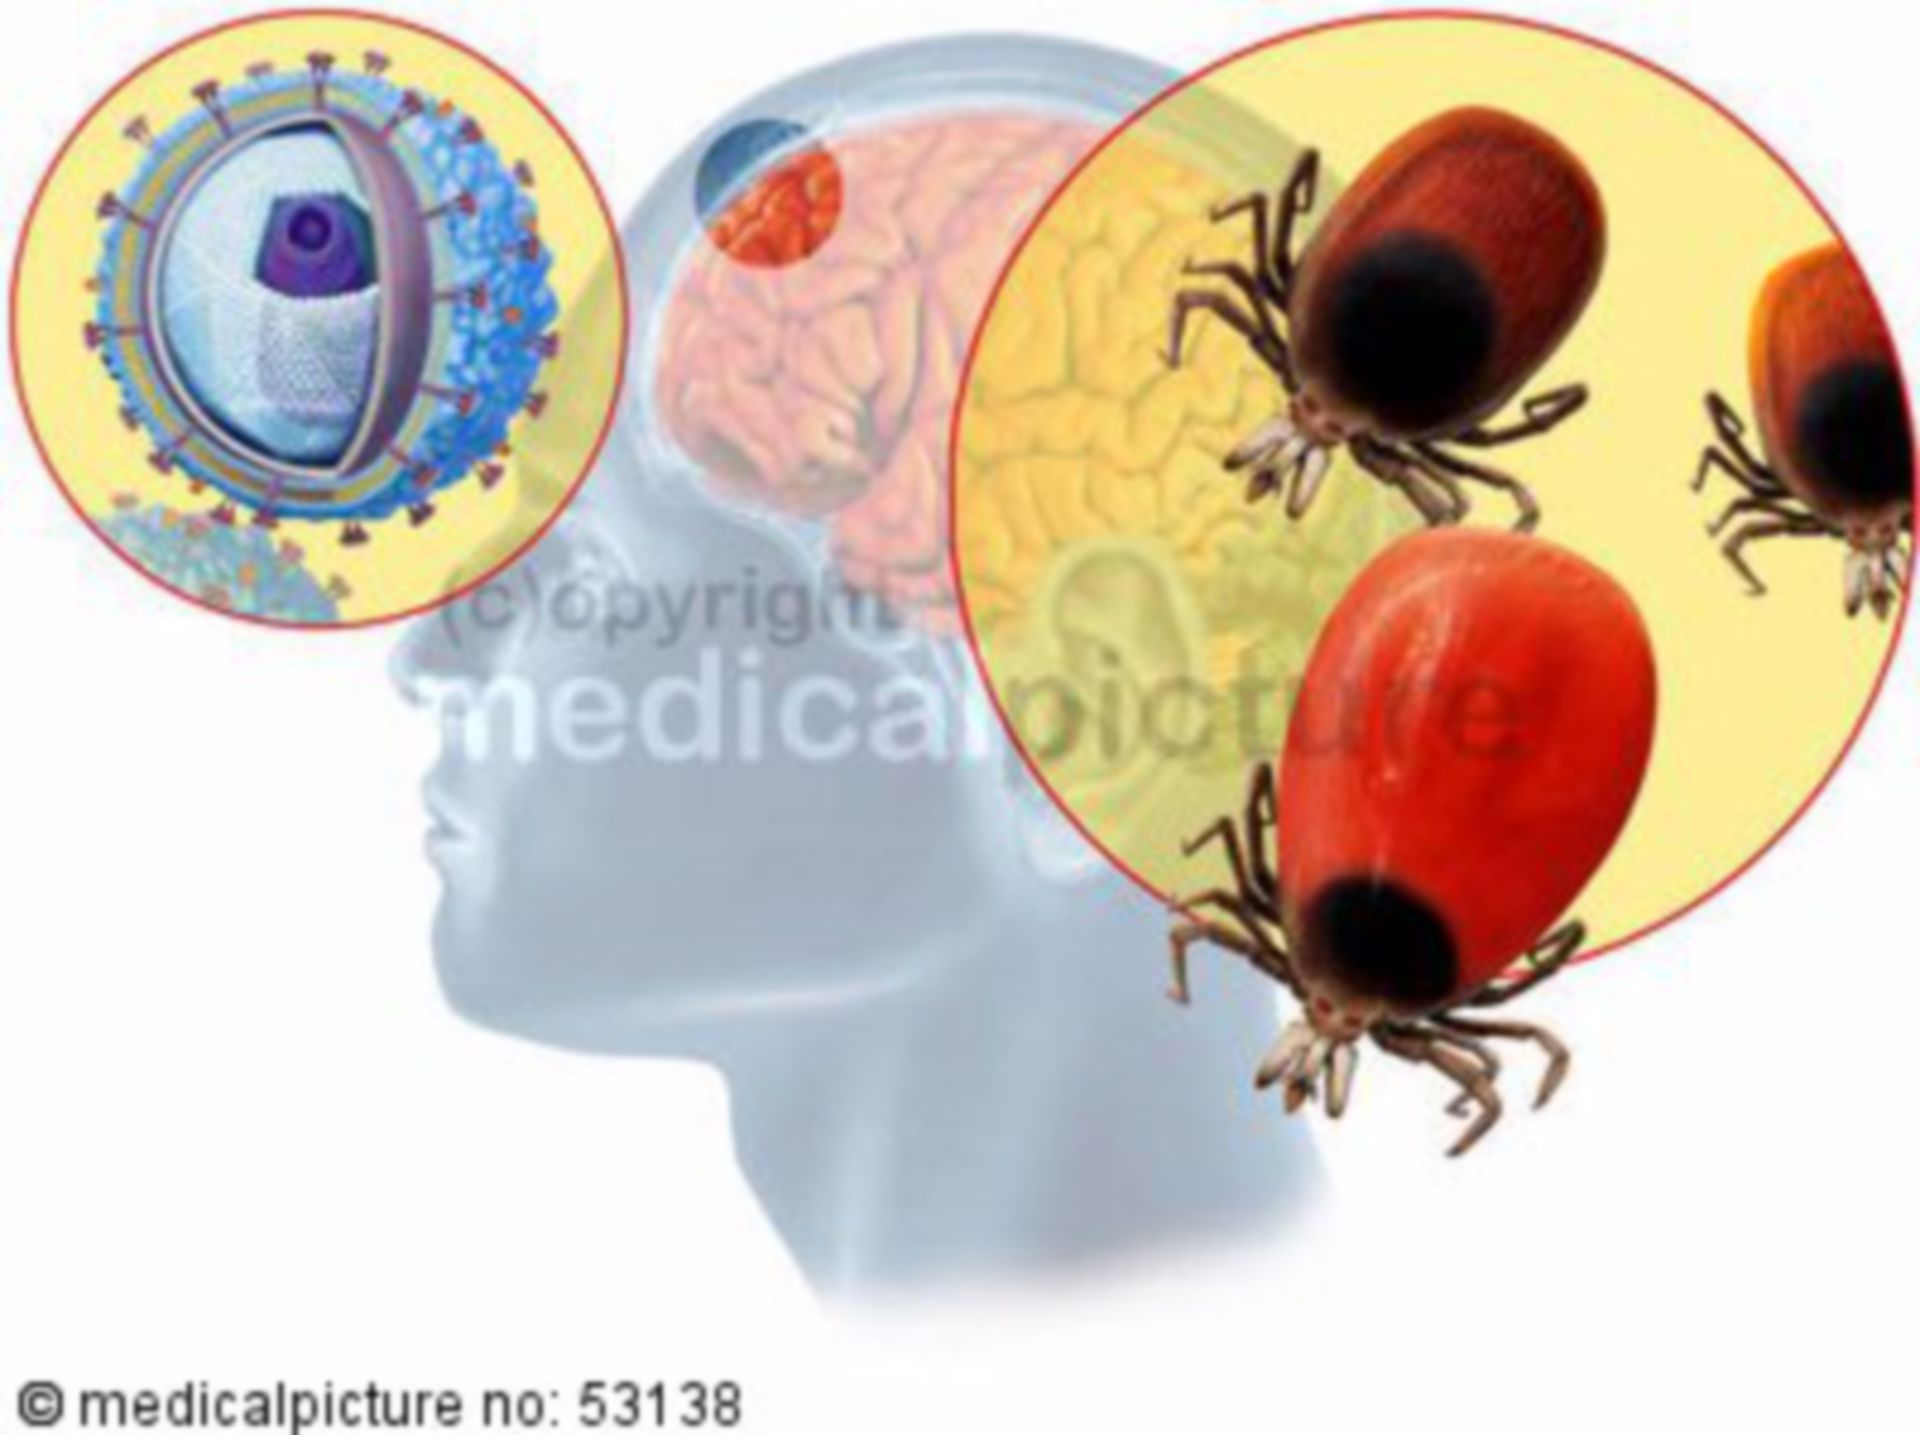 Tick-borne encephalitis (TBE)